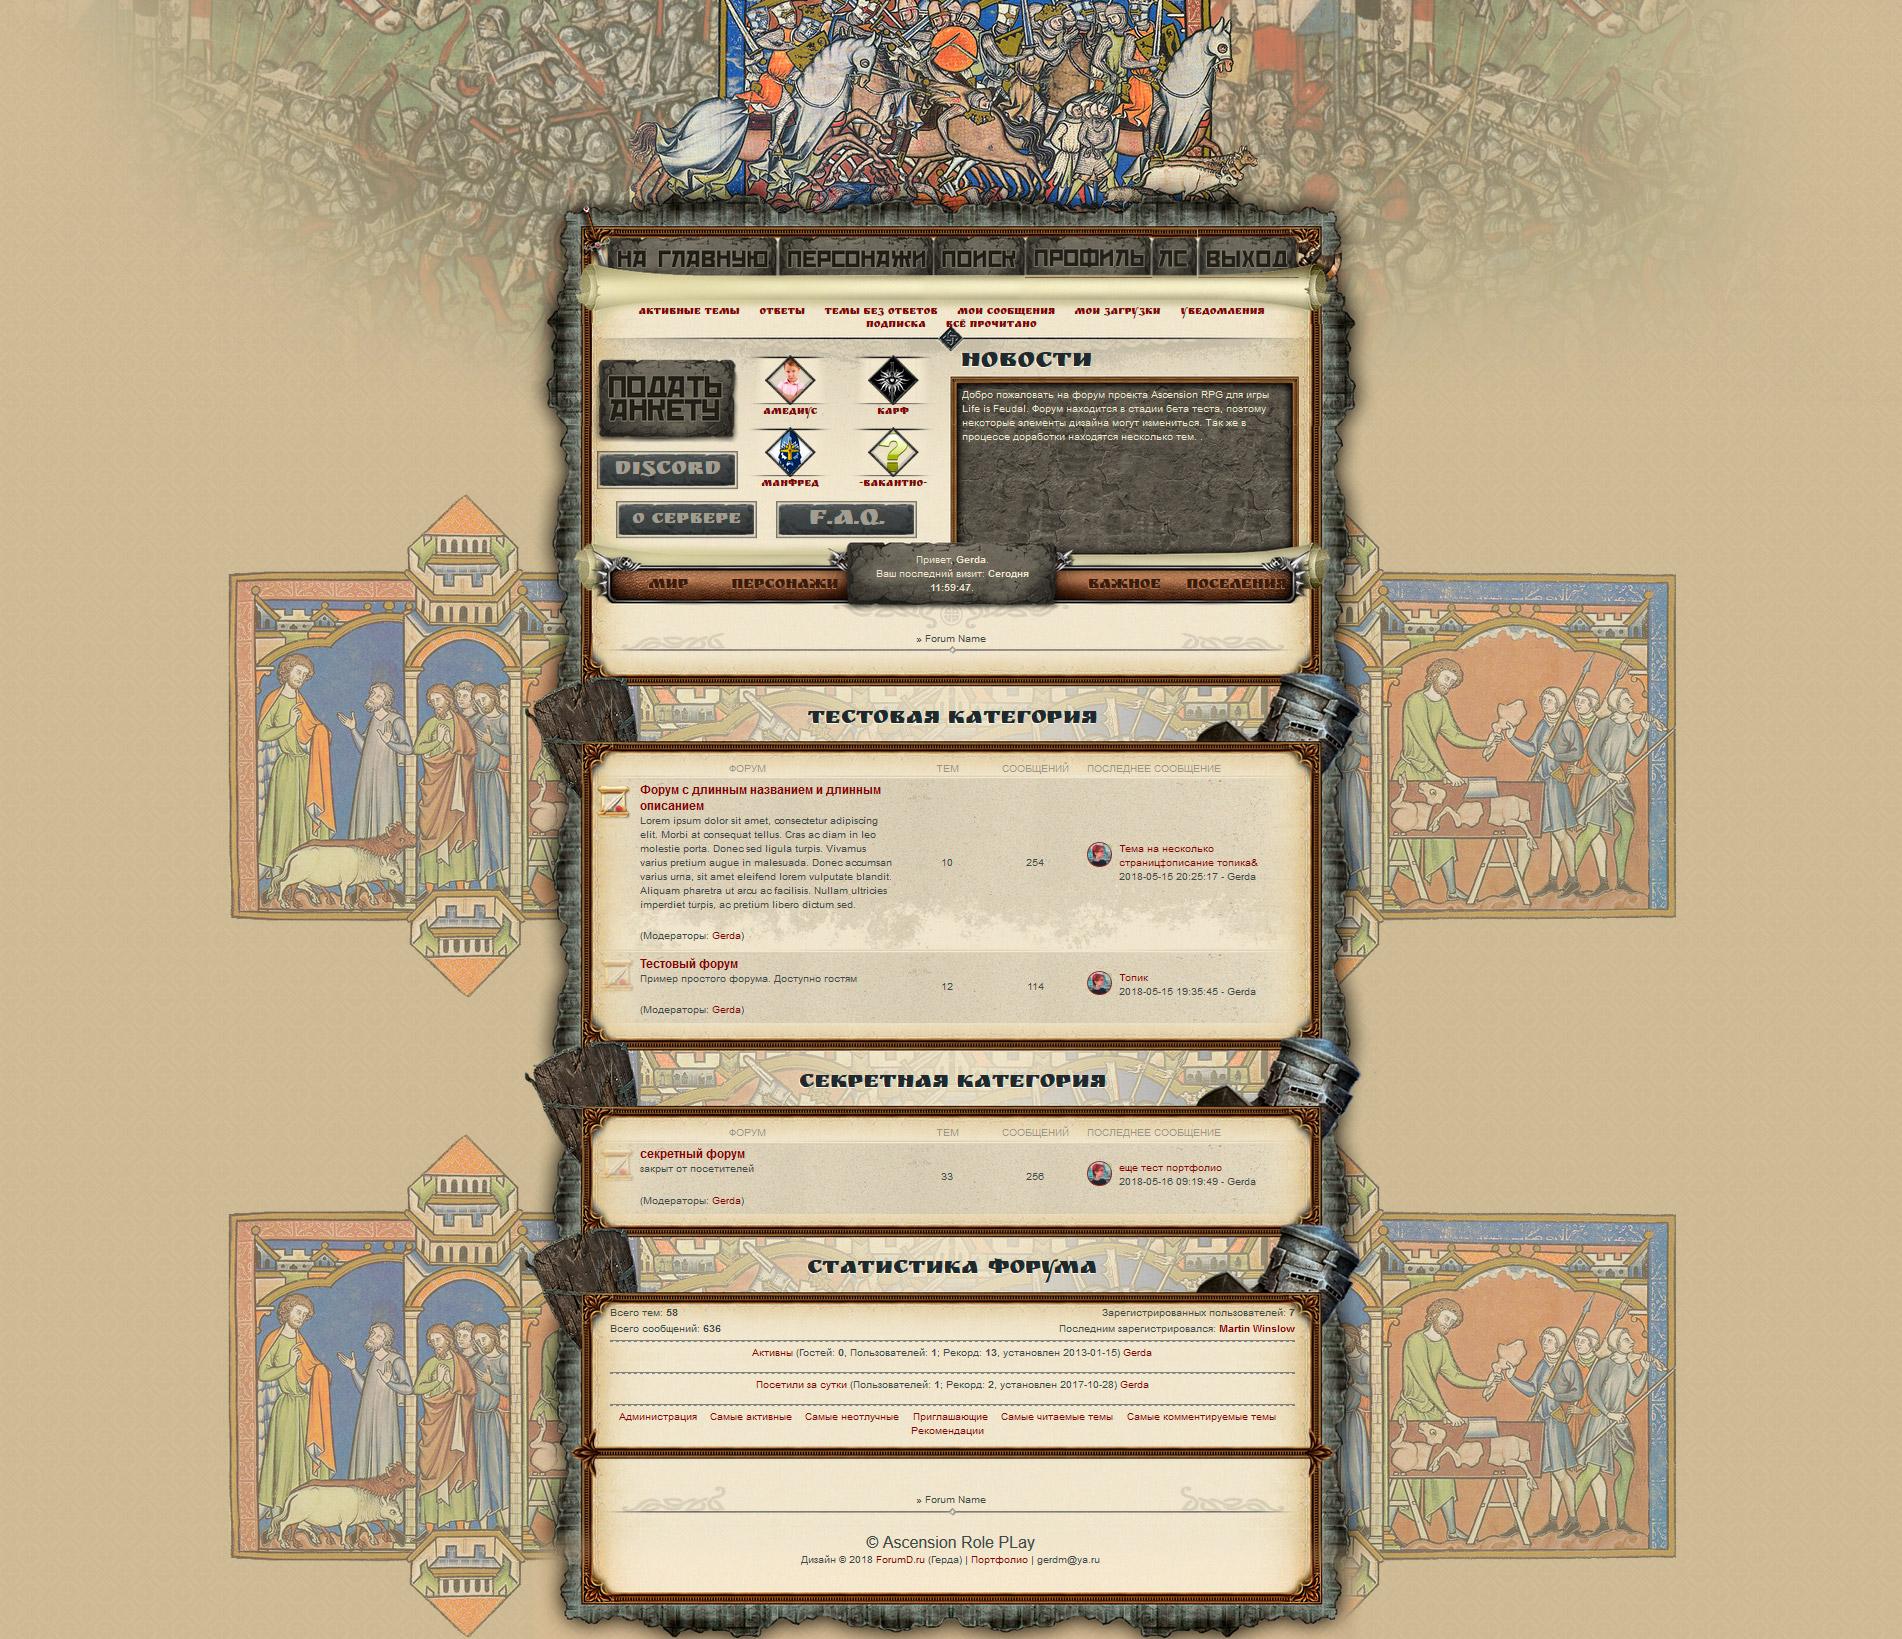 http://gerda.moy.su/MyBB_files/FD/AsRP/AsRP_COVER.jpg